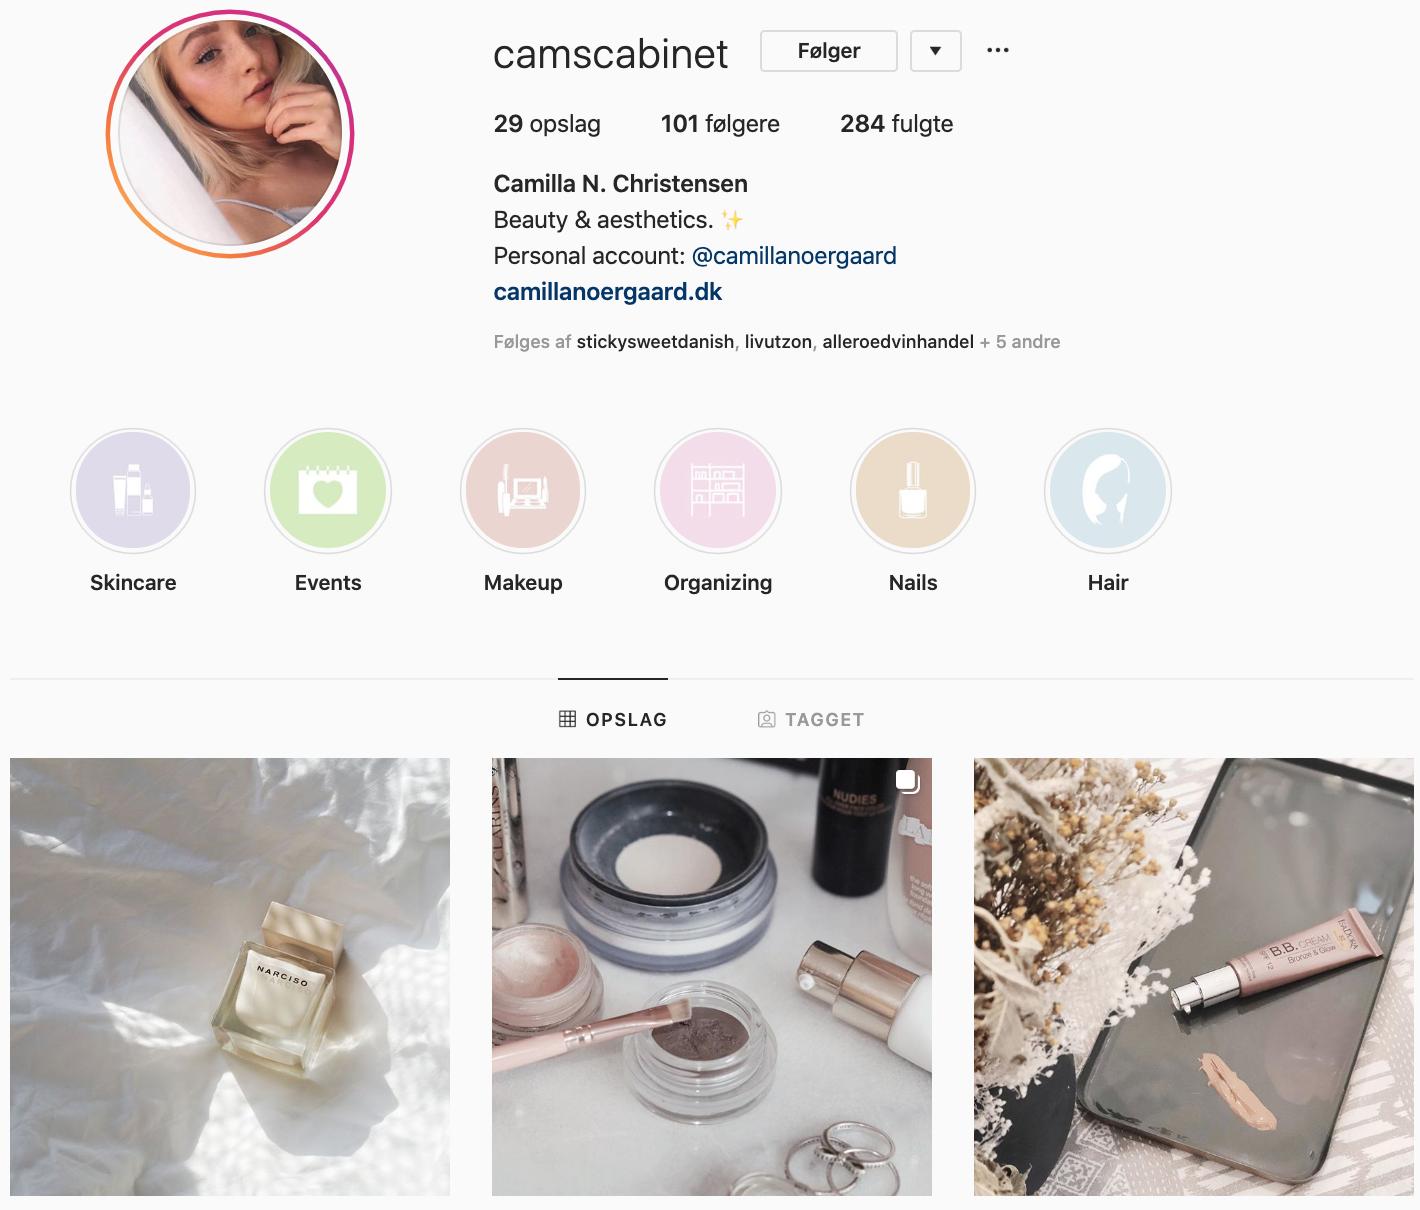 Camillas nye Instagram-profil, @camscabinet